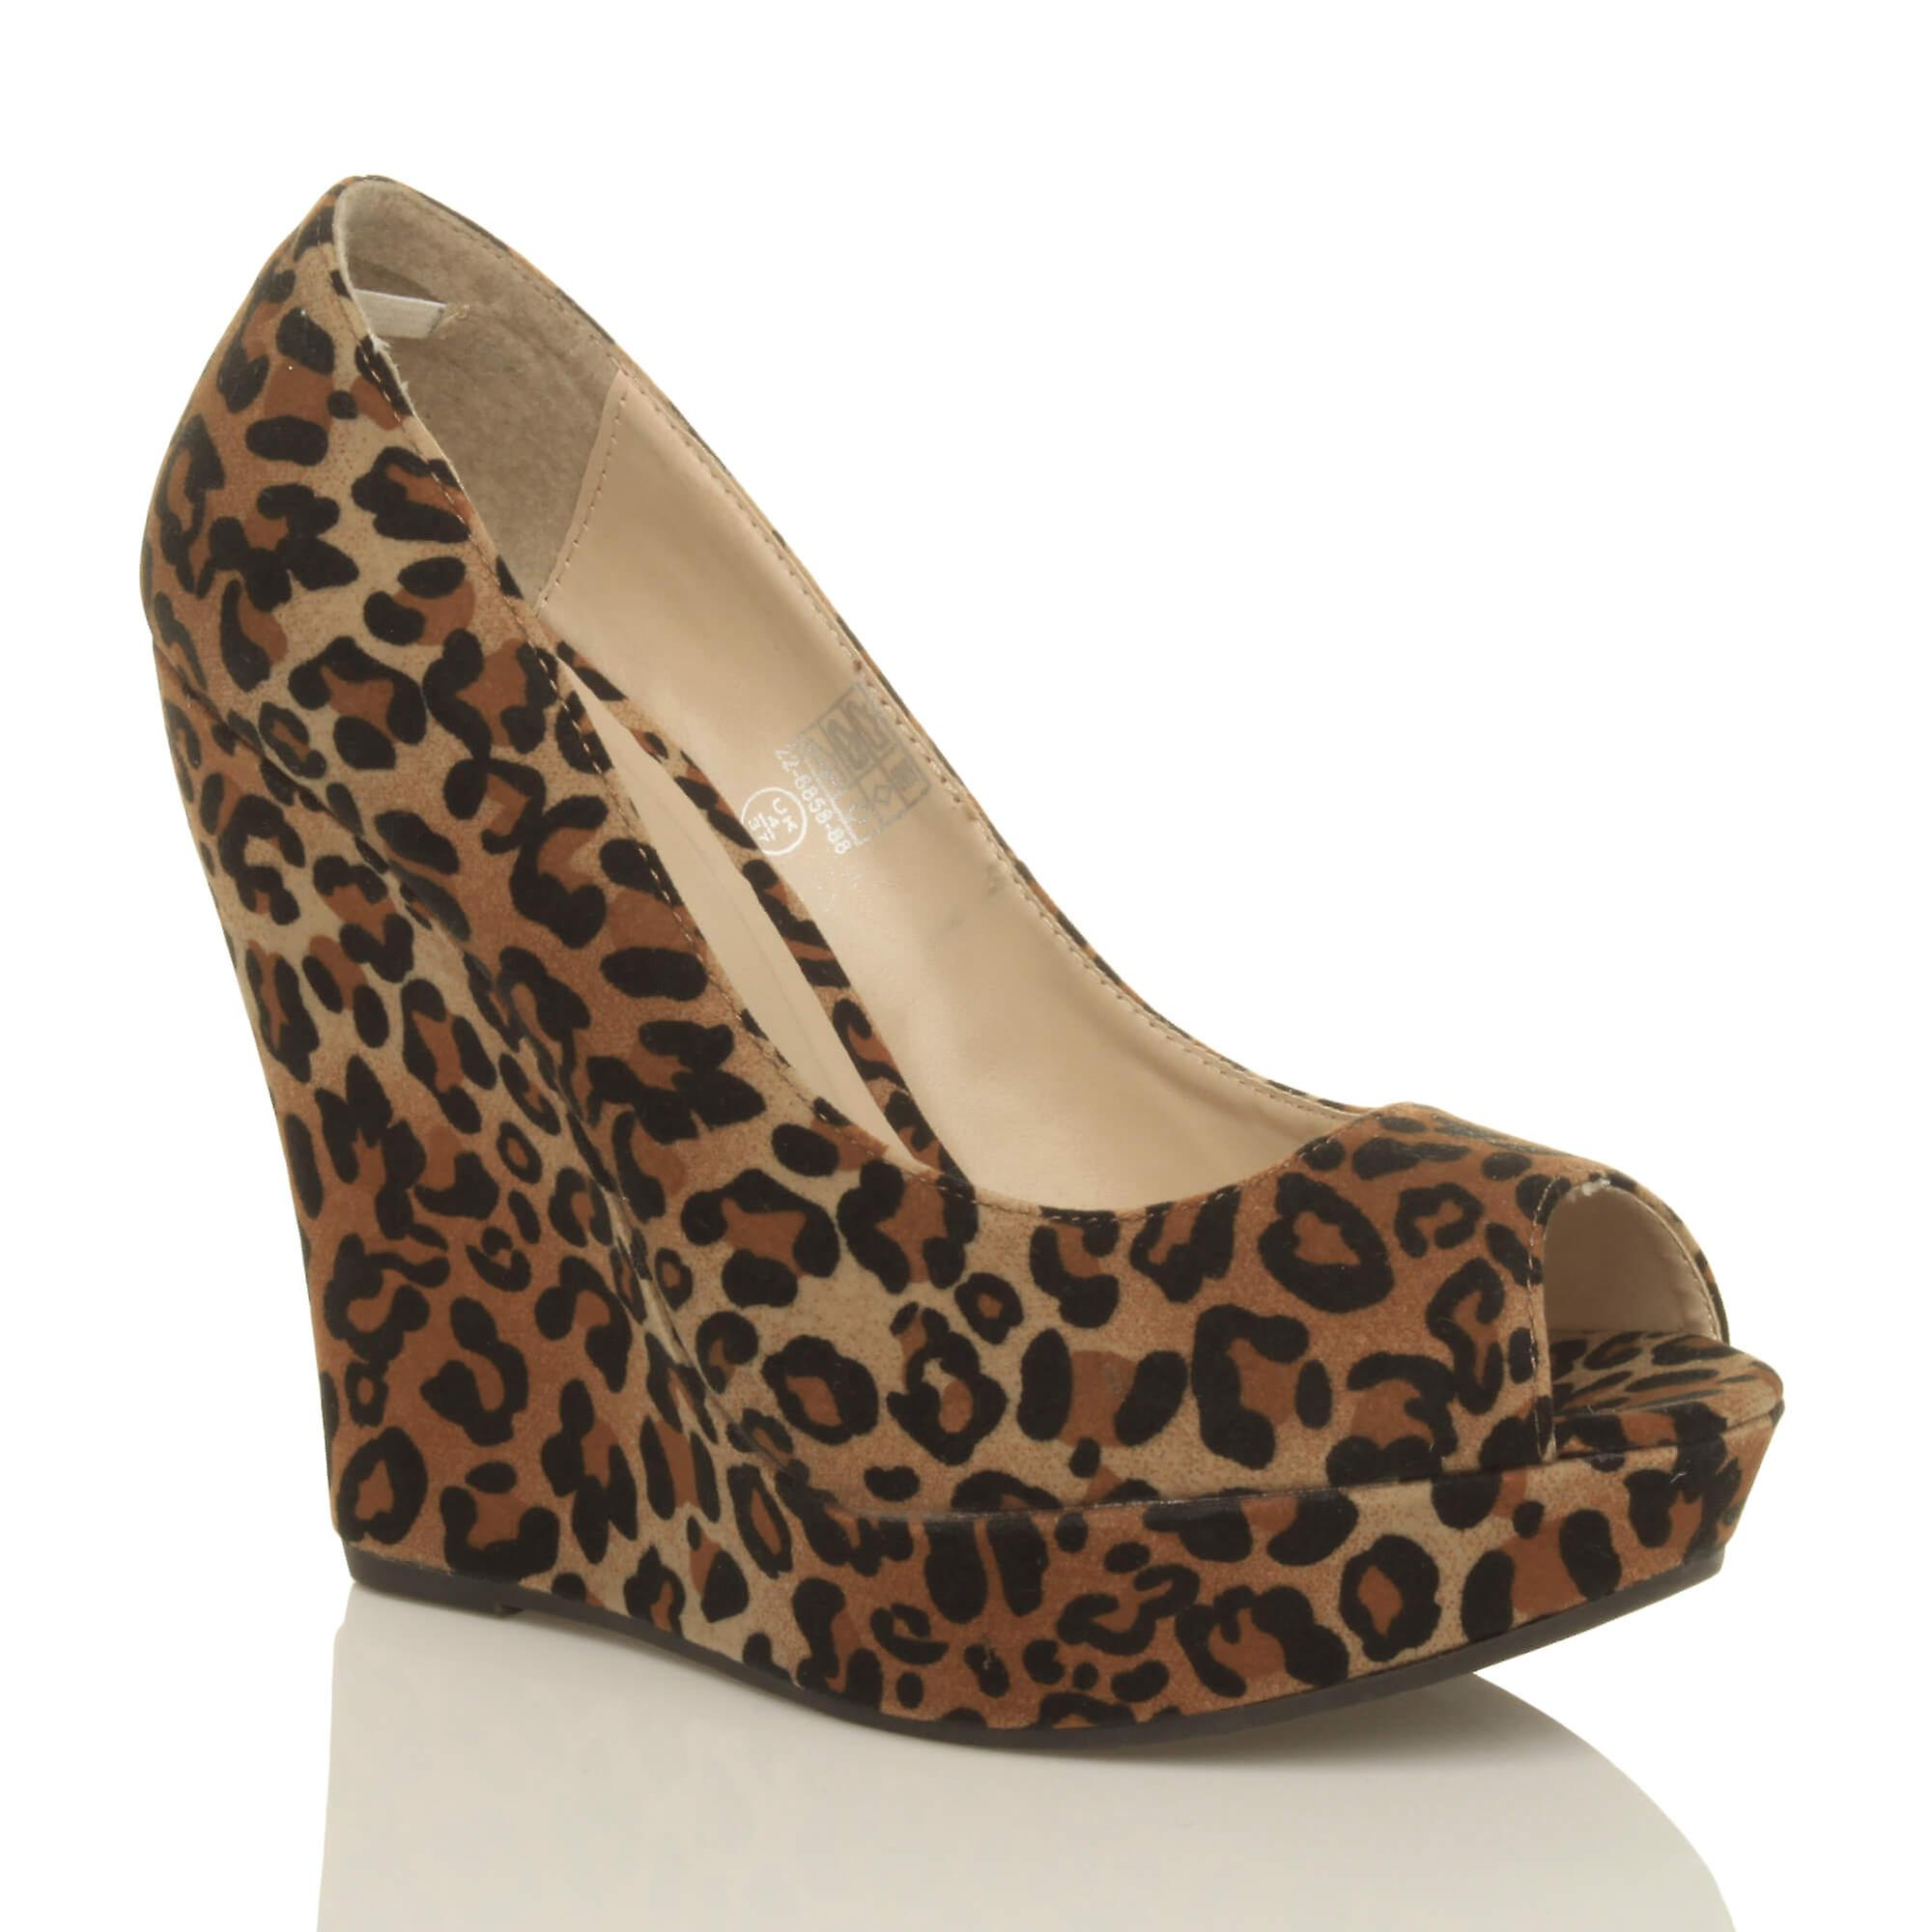 Ajvani womens high heel wedge peep toe platform party court shoes pumps WmPtN